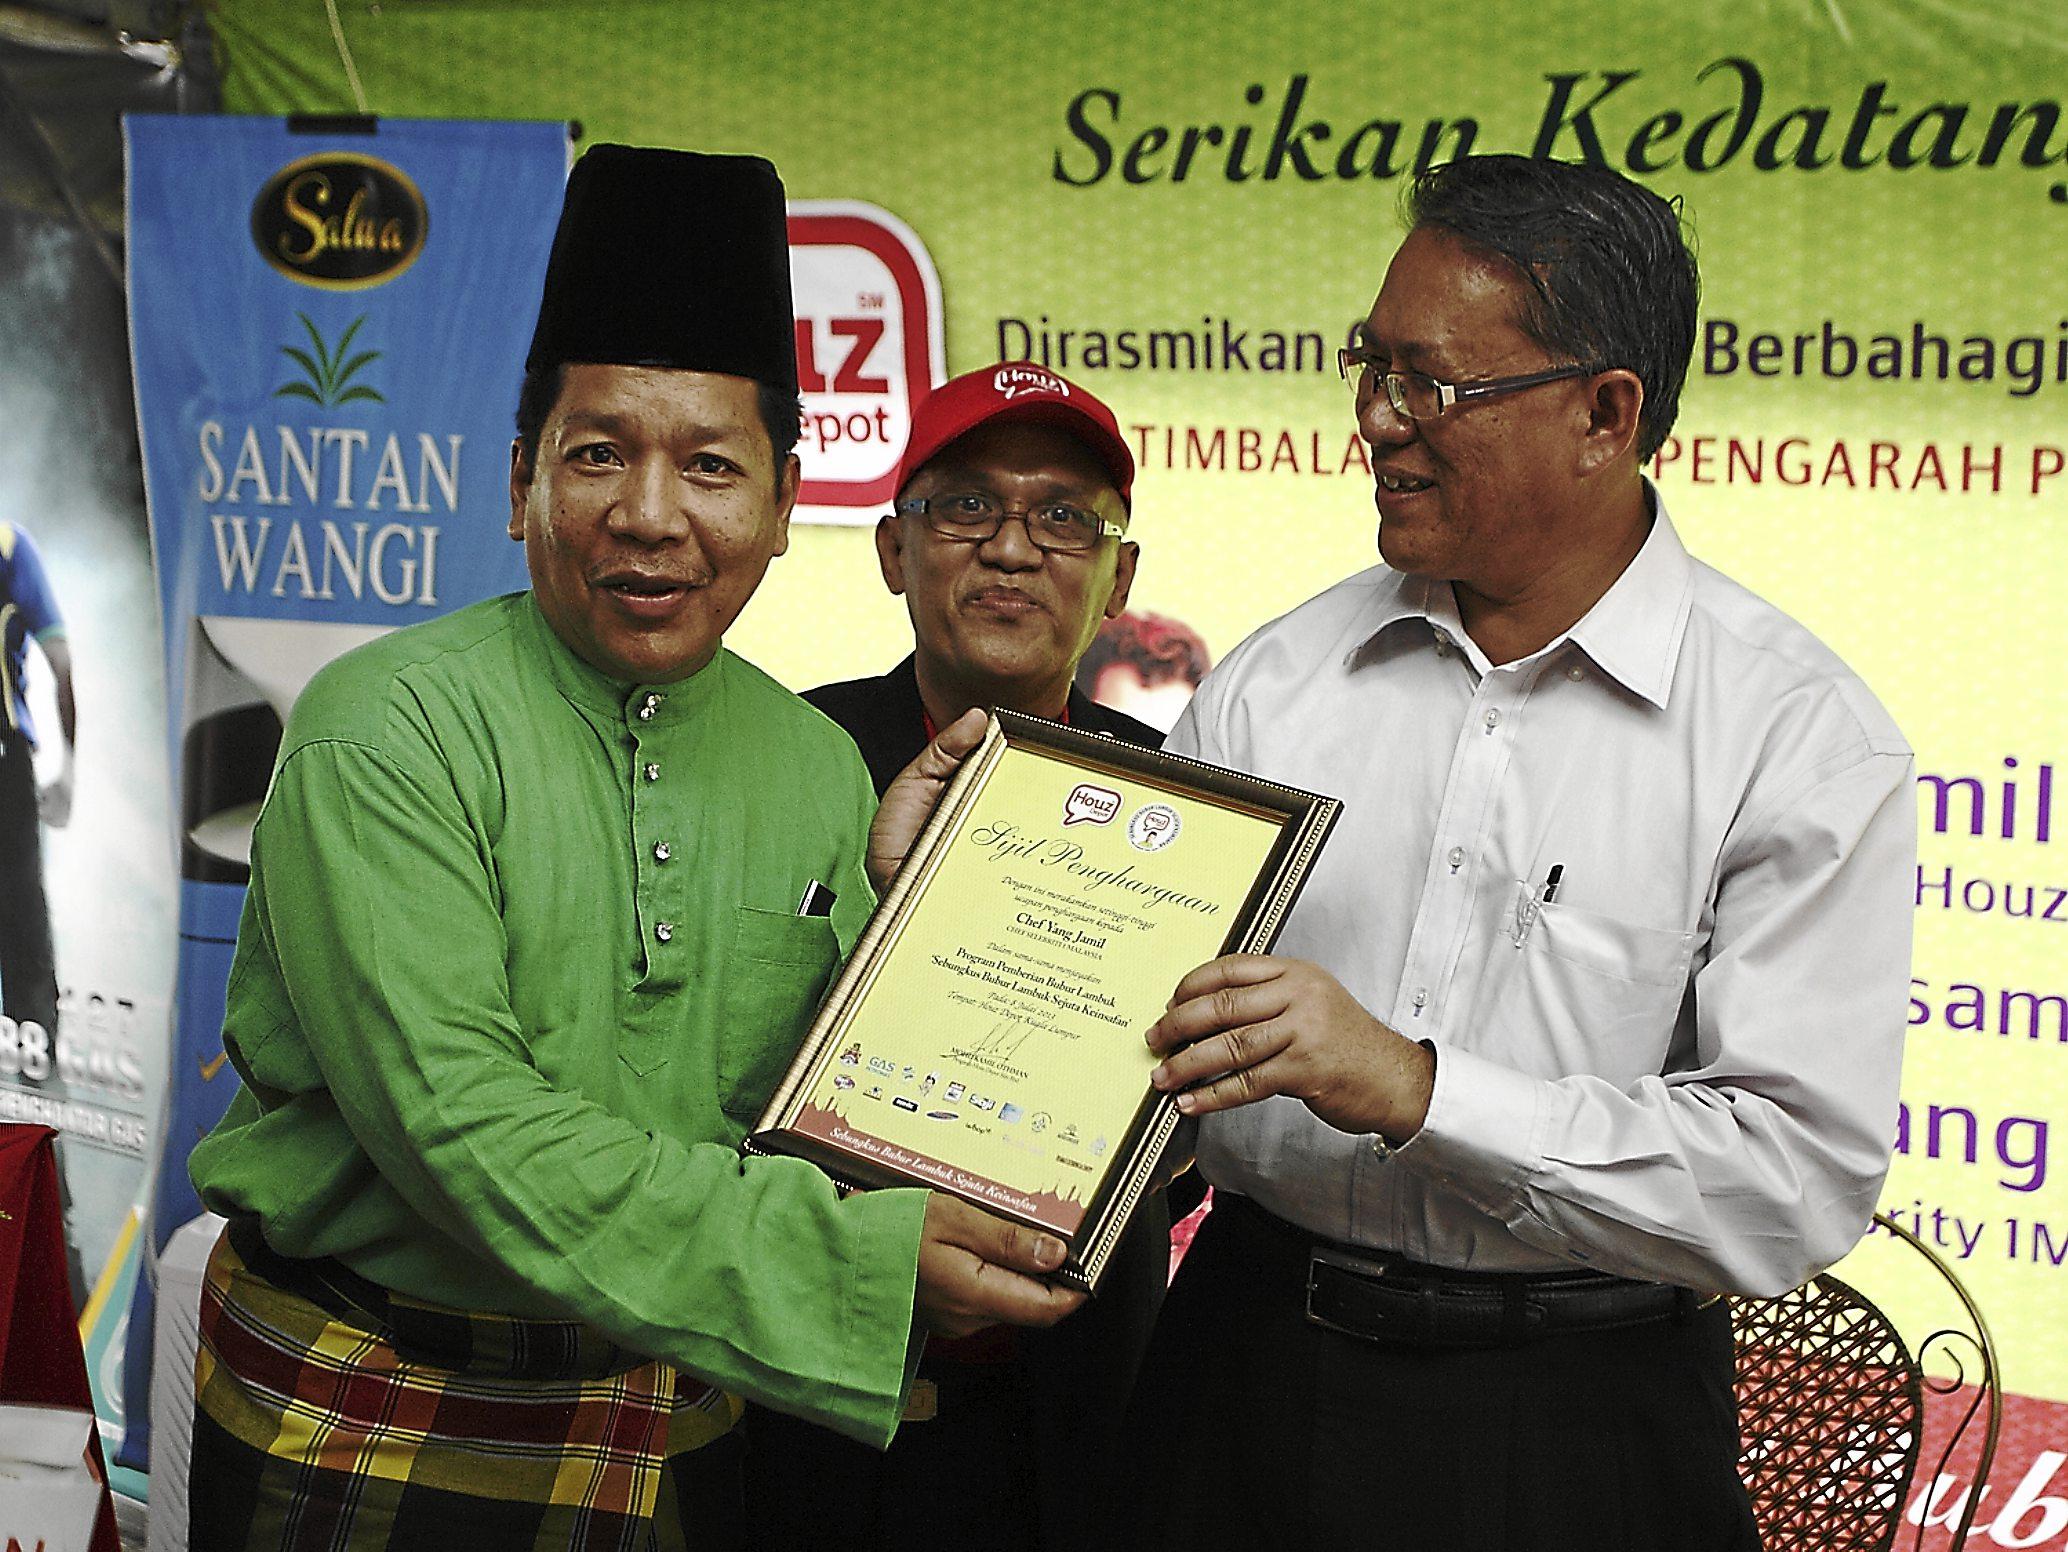 Datuk Haji Mhd. Amin Nordin B. Abdul Aziz (Deputy Head Director of DBKL Development & SocioEconomy) handing out the certificate of appreciation to Chef Yang Jamil (1 Malaysia celebrity chef)